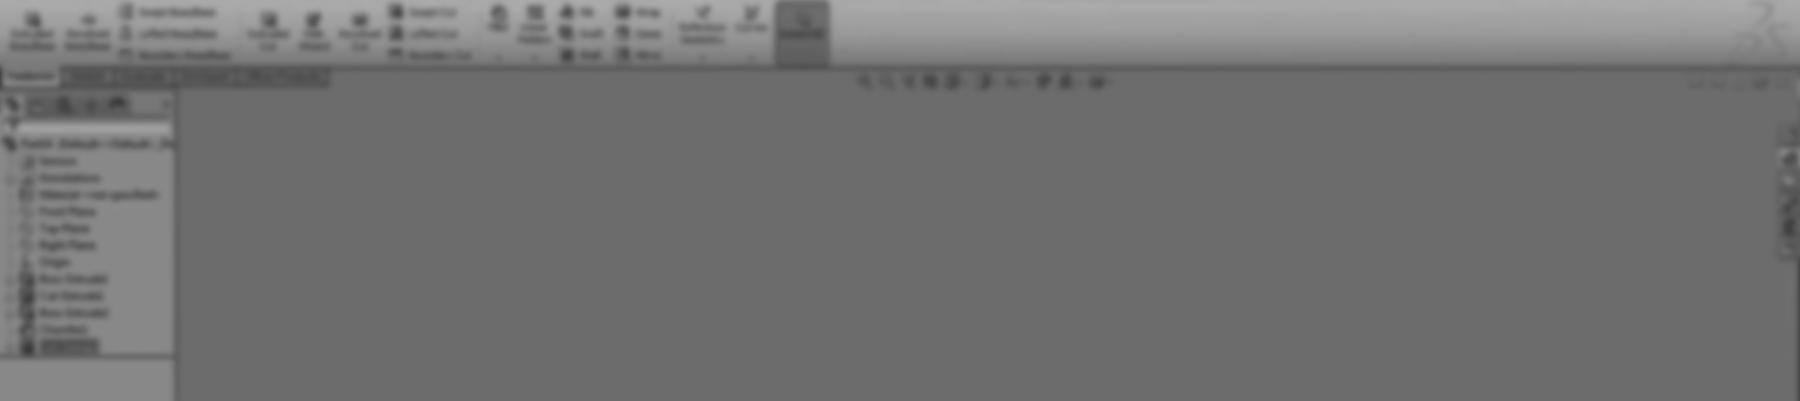 DESIGN TOOLS: SOLID WORKS AND DIGITAL MOCKUP